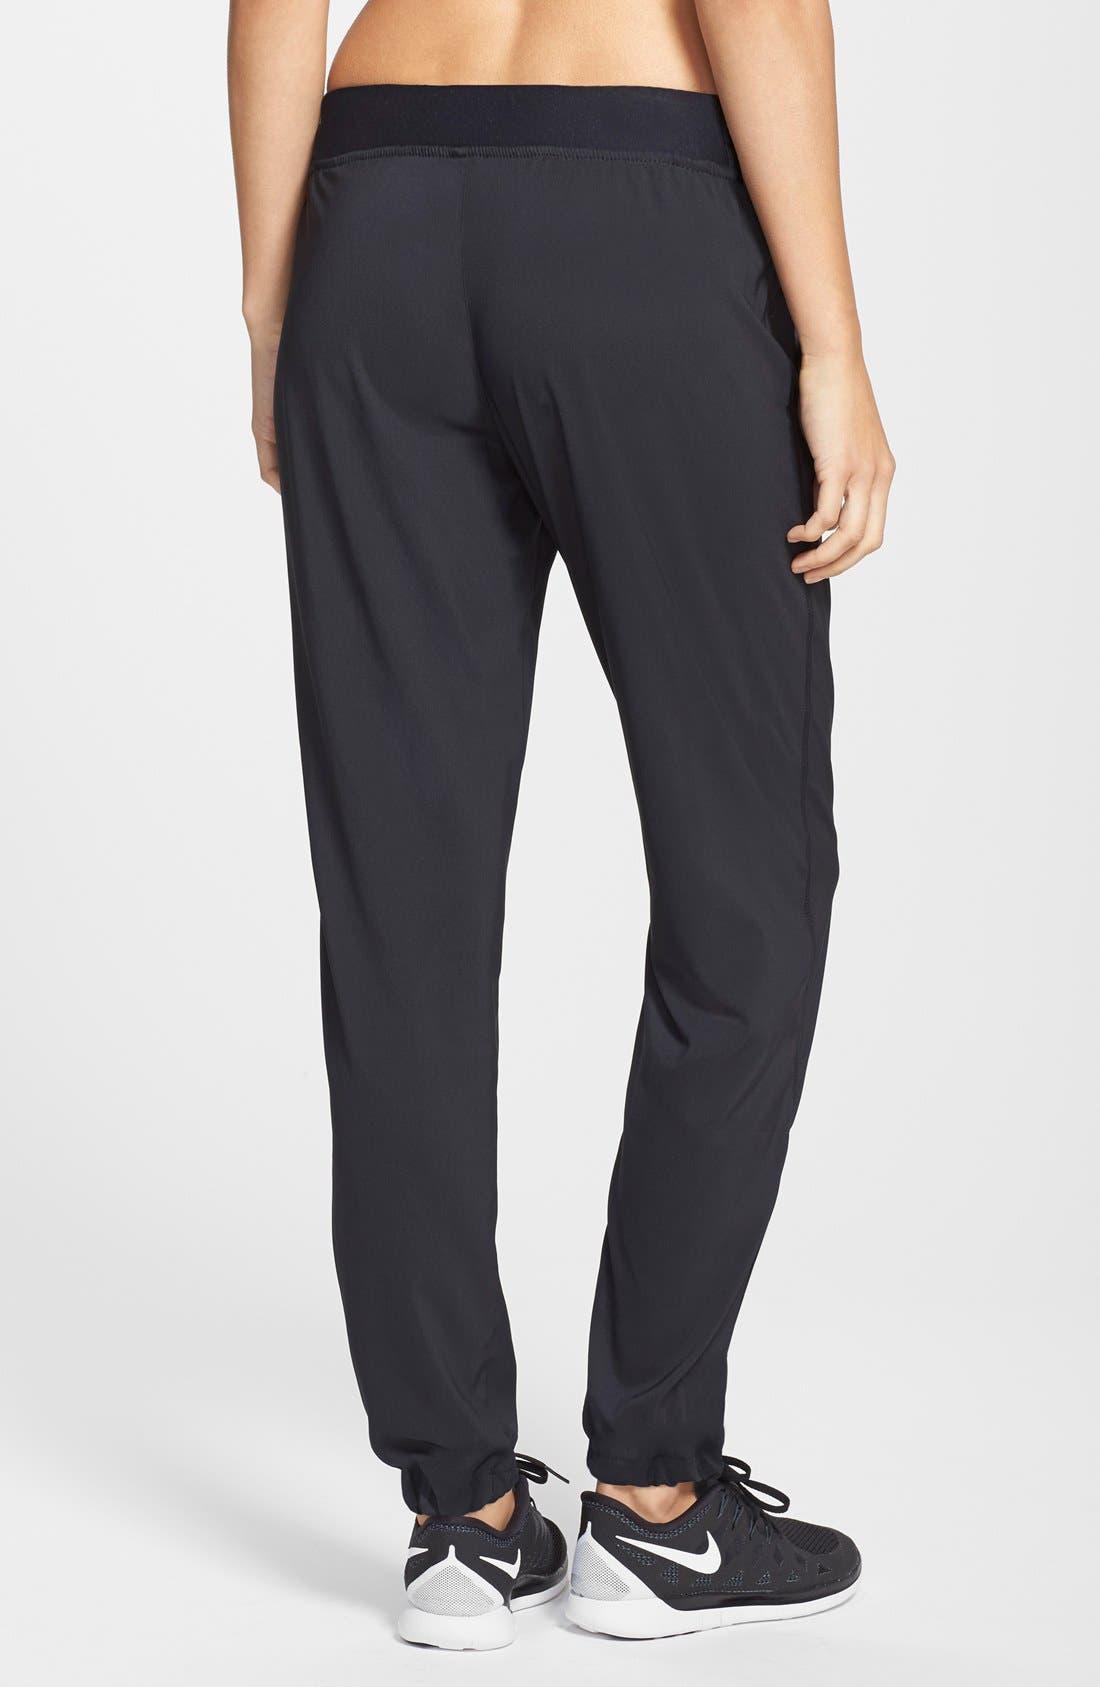 Alternate Image 2  - Nike 'Revival' Woven Dri-FIT Sweatpants